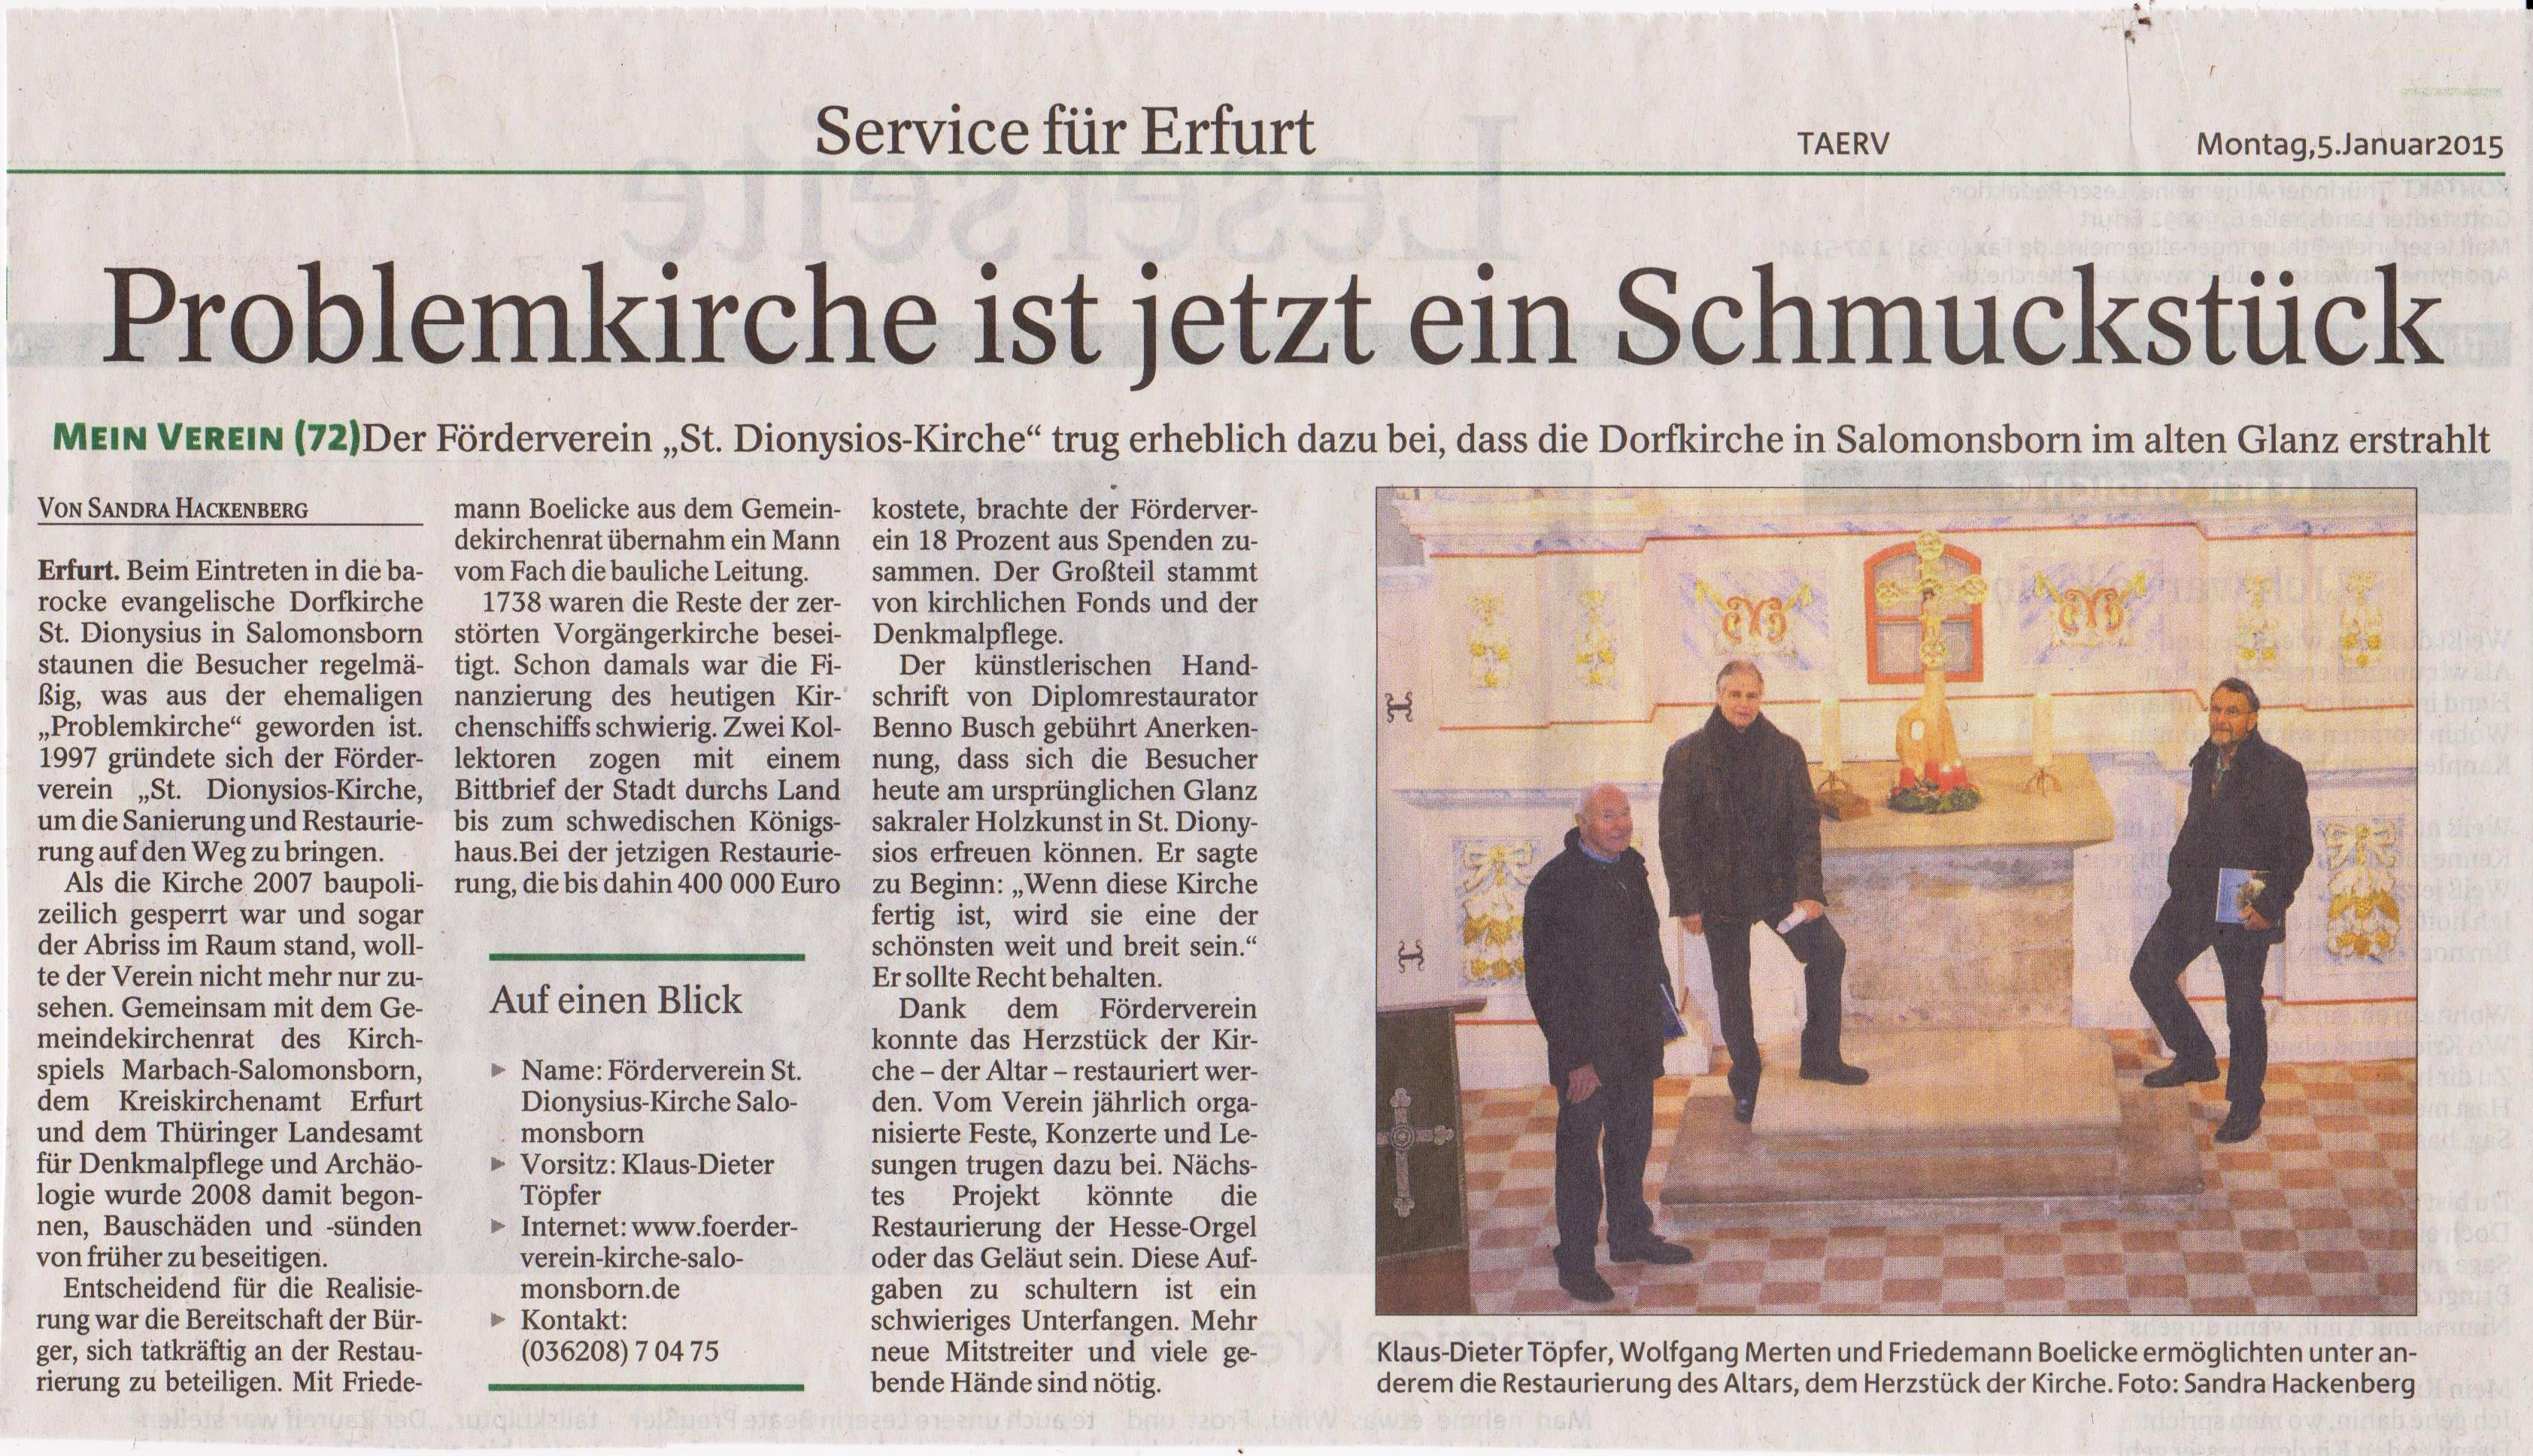 Problemkirche 001